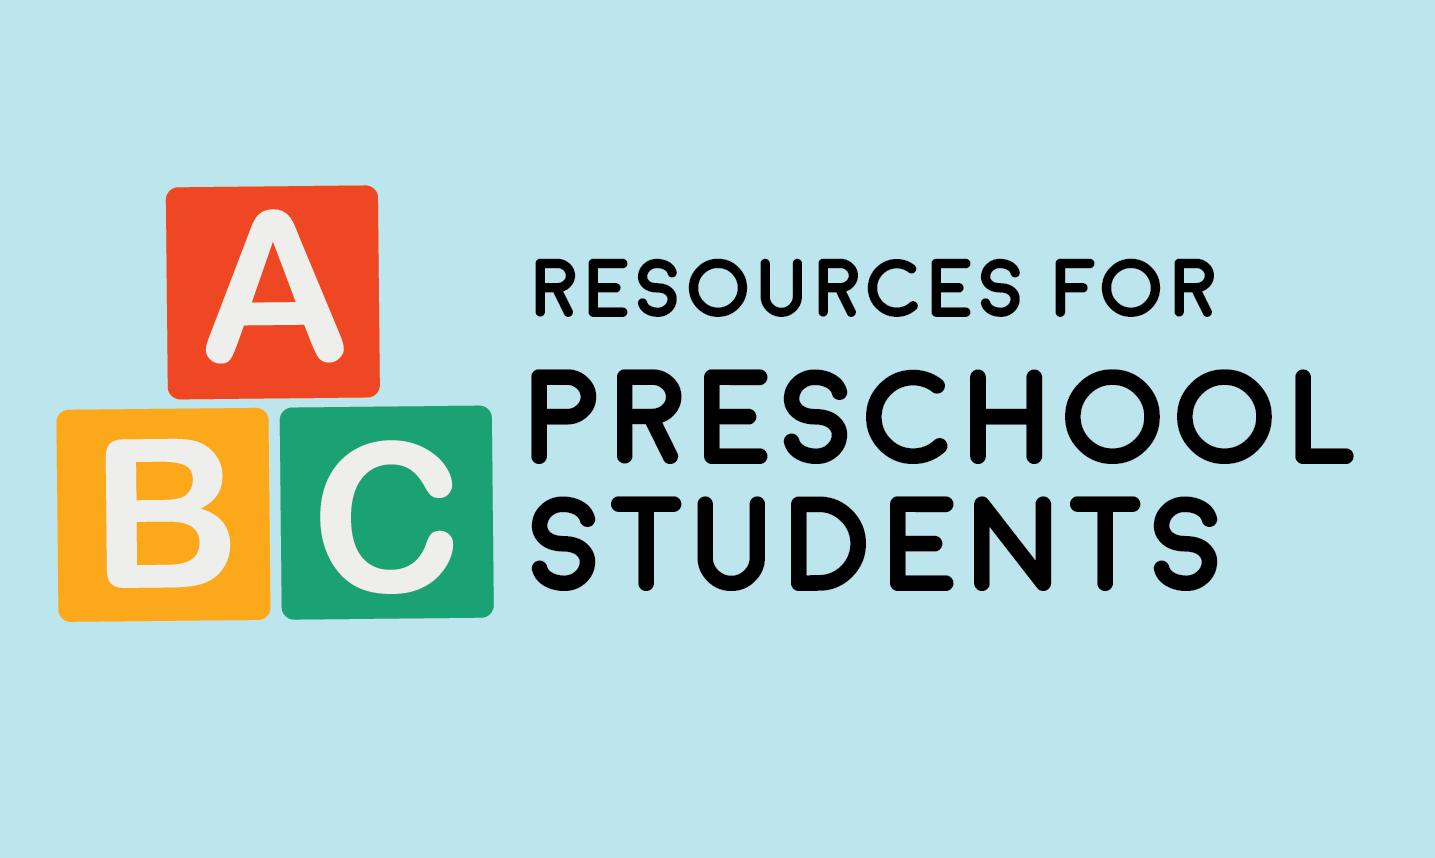 Preschool resources image